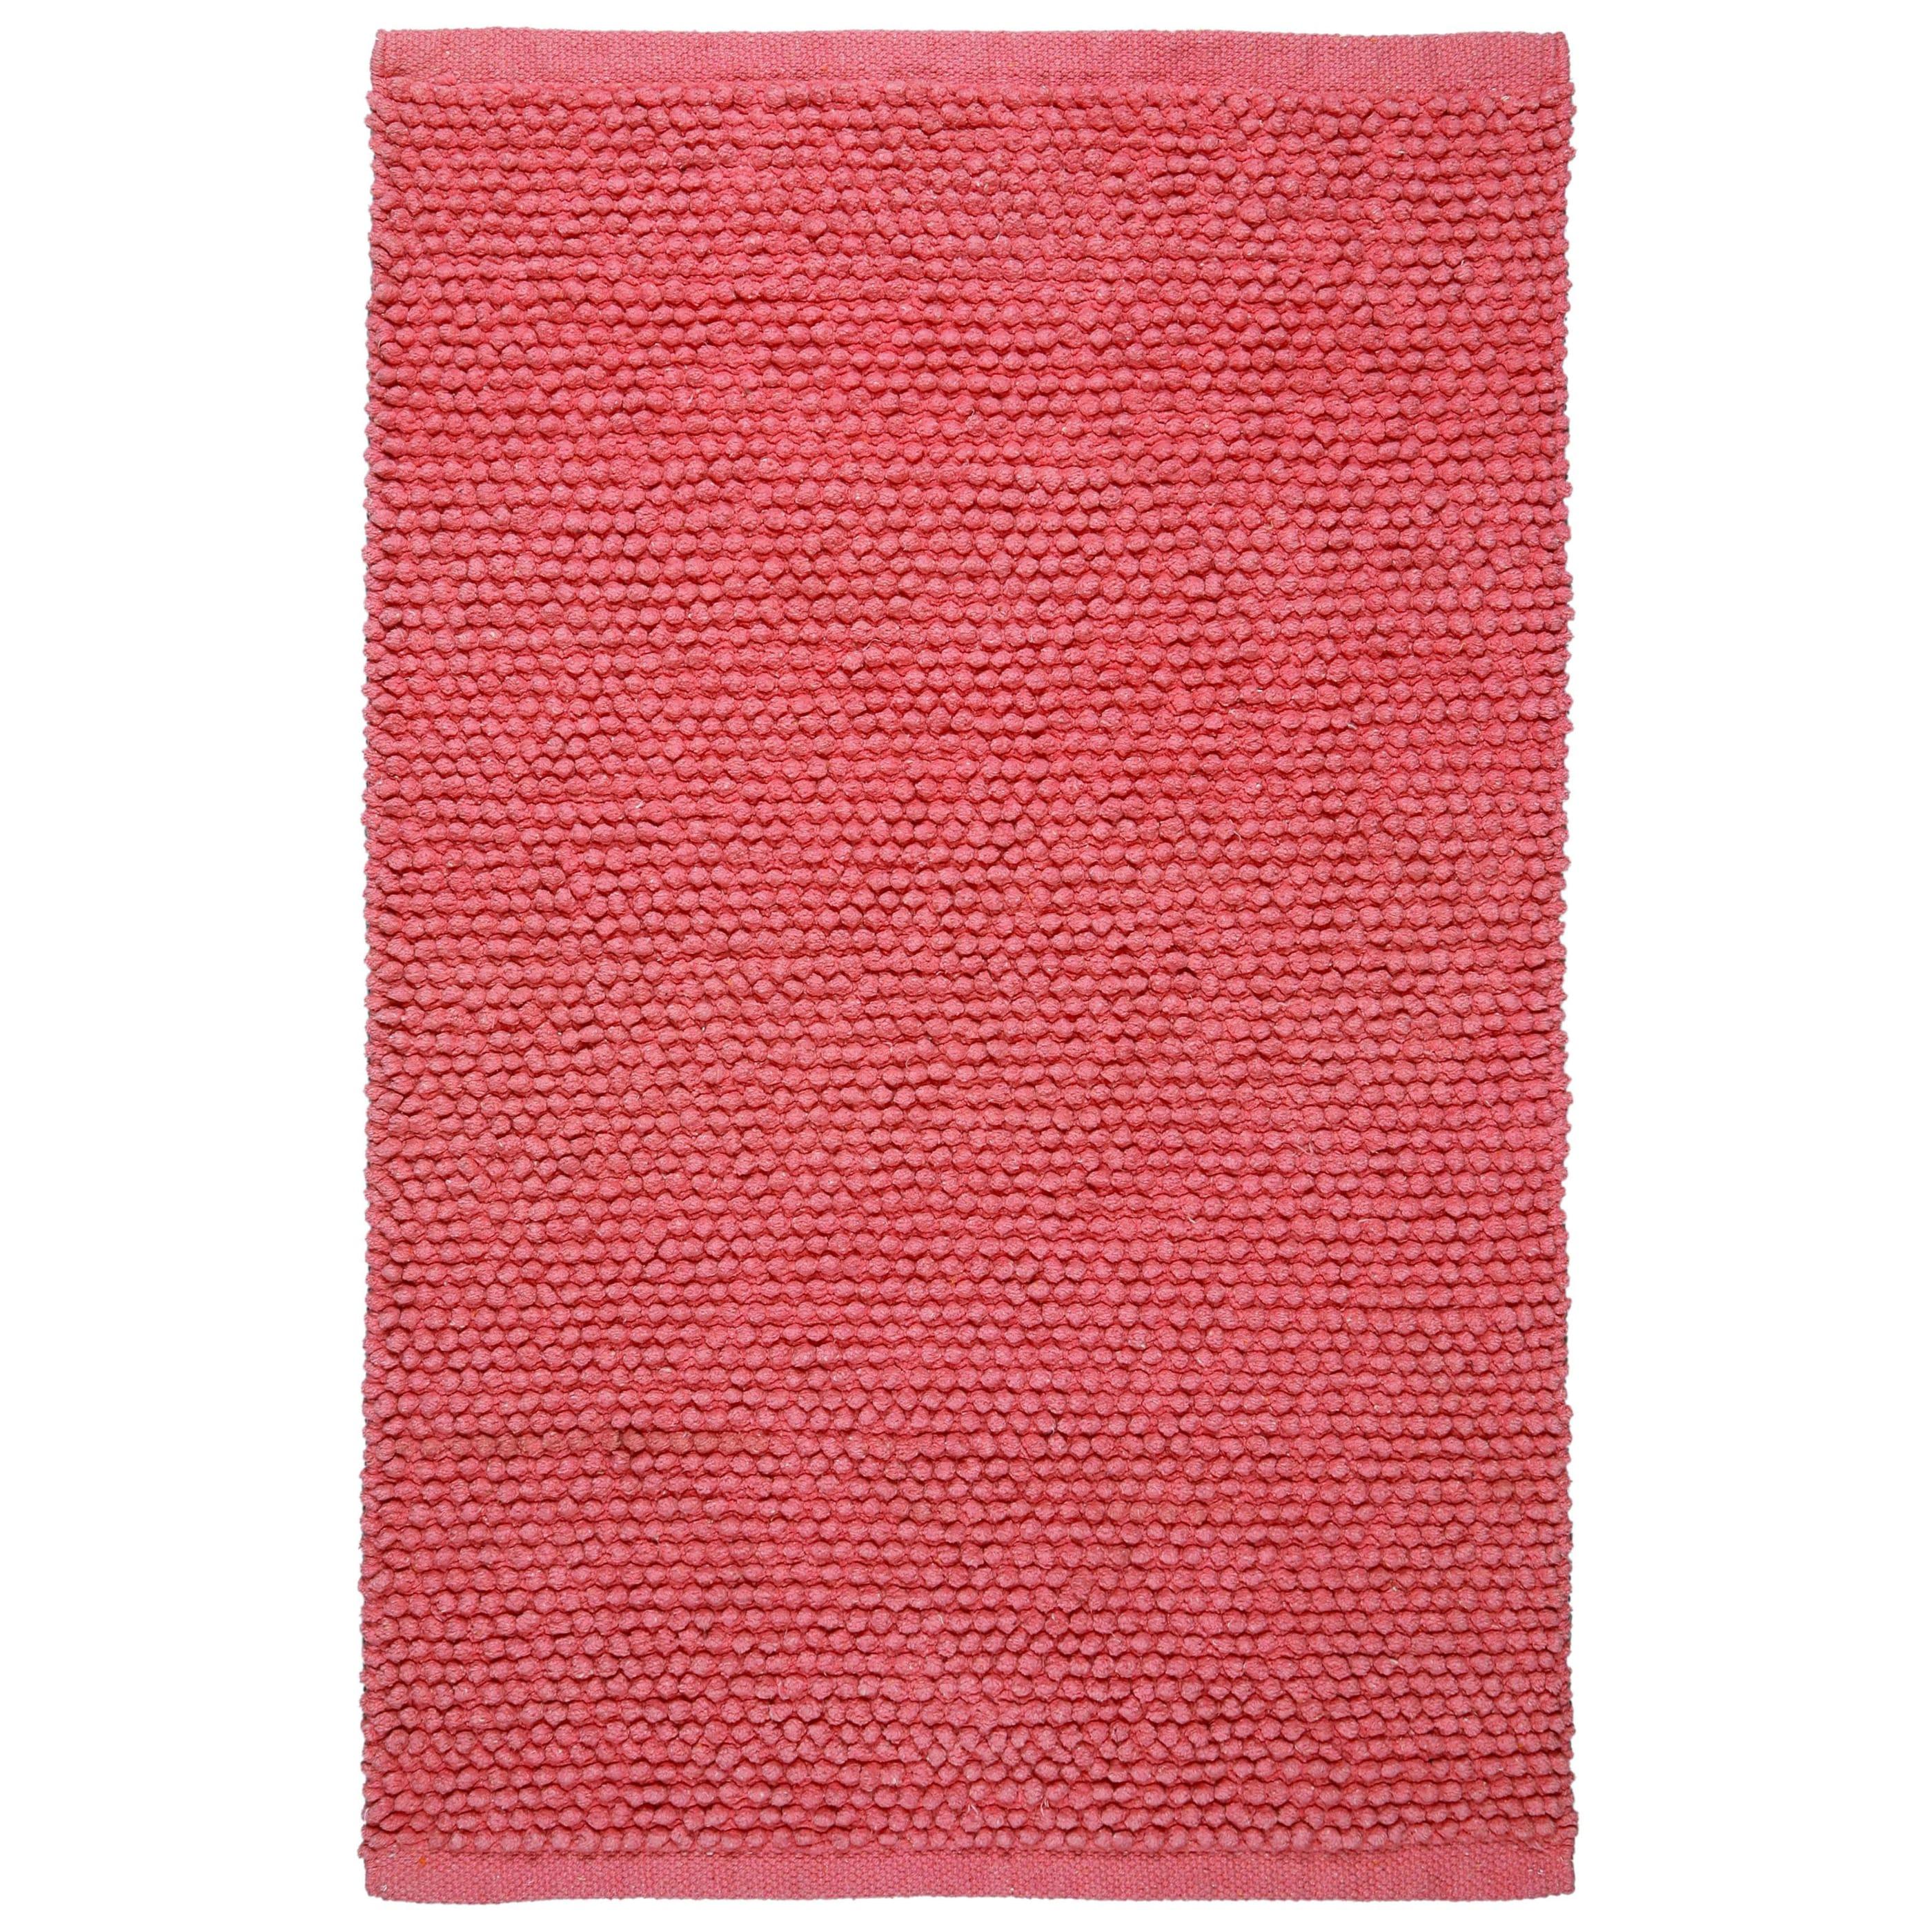 Shop Carousel Plush Nubby Pink Bath Rug 2 6 X 4 2 Overstock 10676940